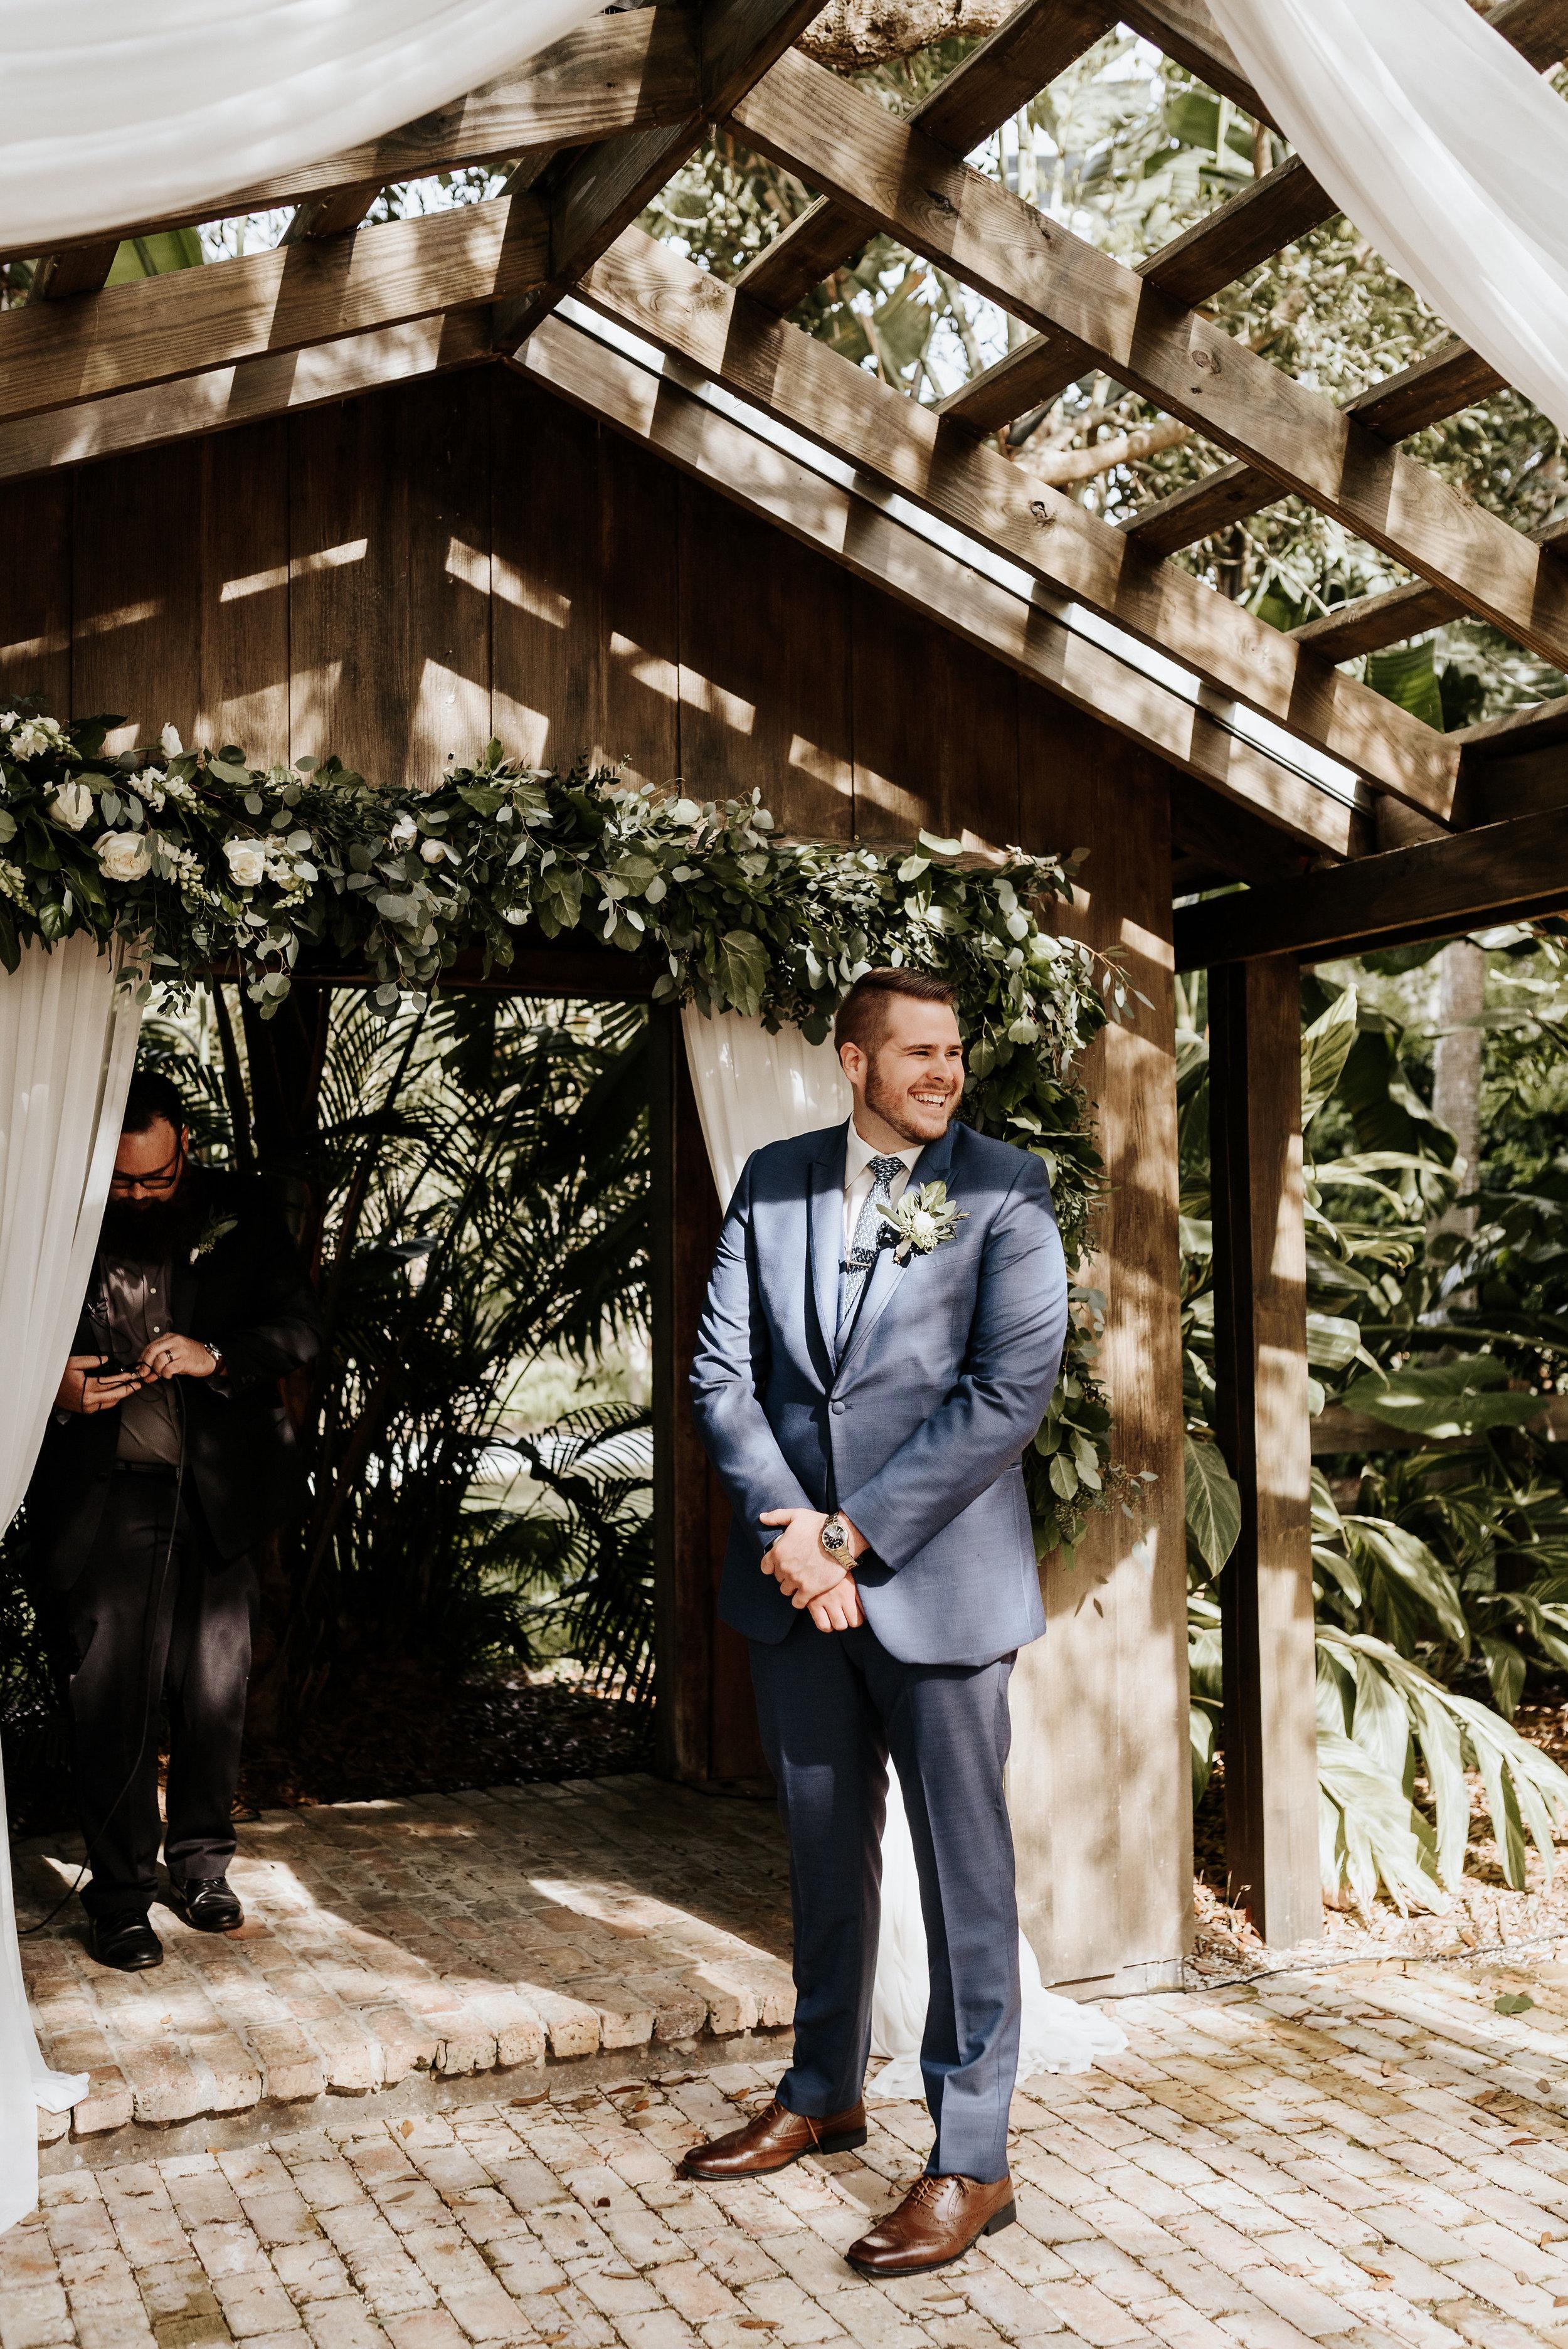 Mikenzi_Brad_Wedding_The_Delamater_House_New_Smyrna_Beach_Florida_Photography_by_V_0044.jpg